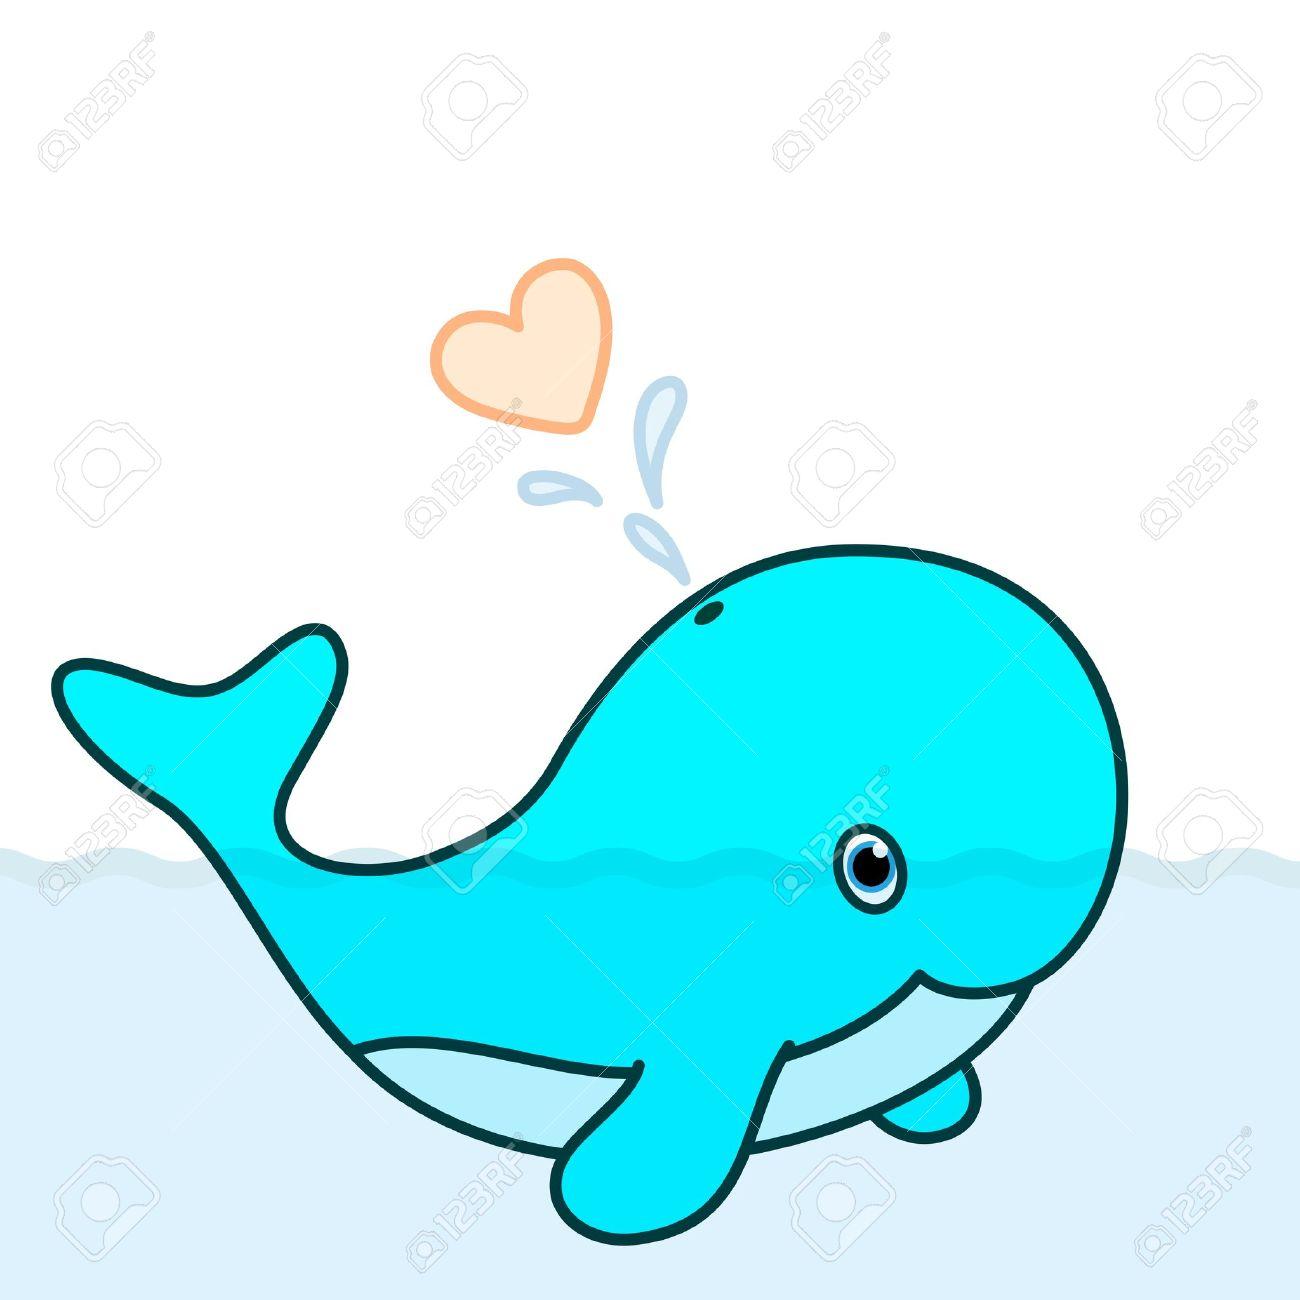 cute baby whale cartoon character blowing a heart water splash rh 123rf com baby beluga whale cartoon baby whale cartoon pictures